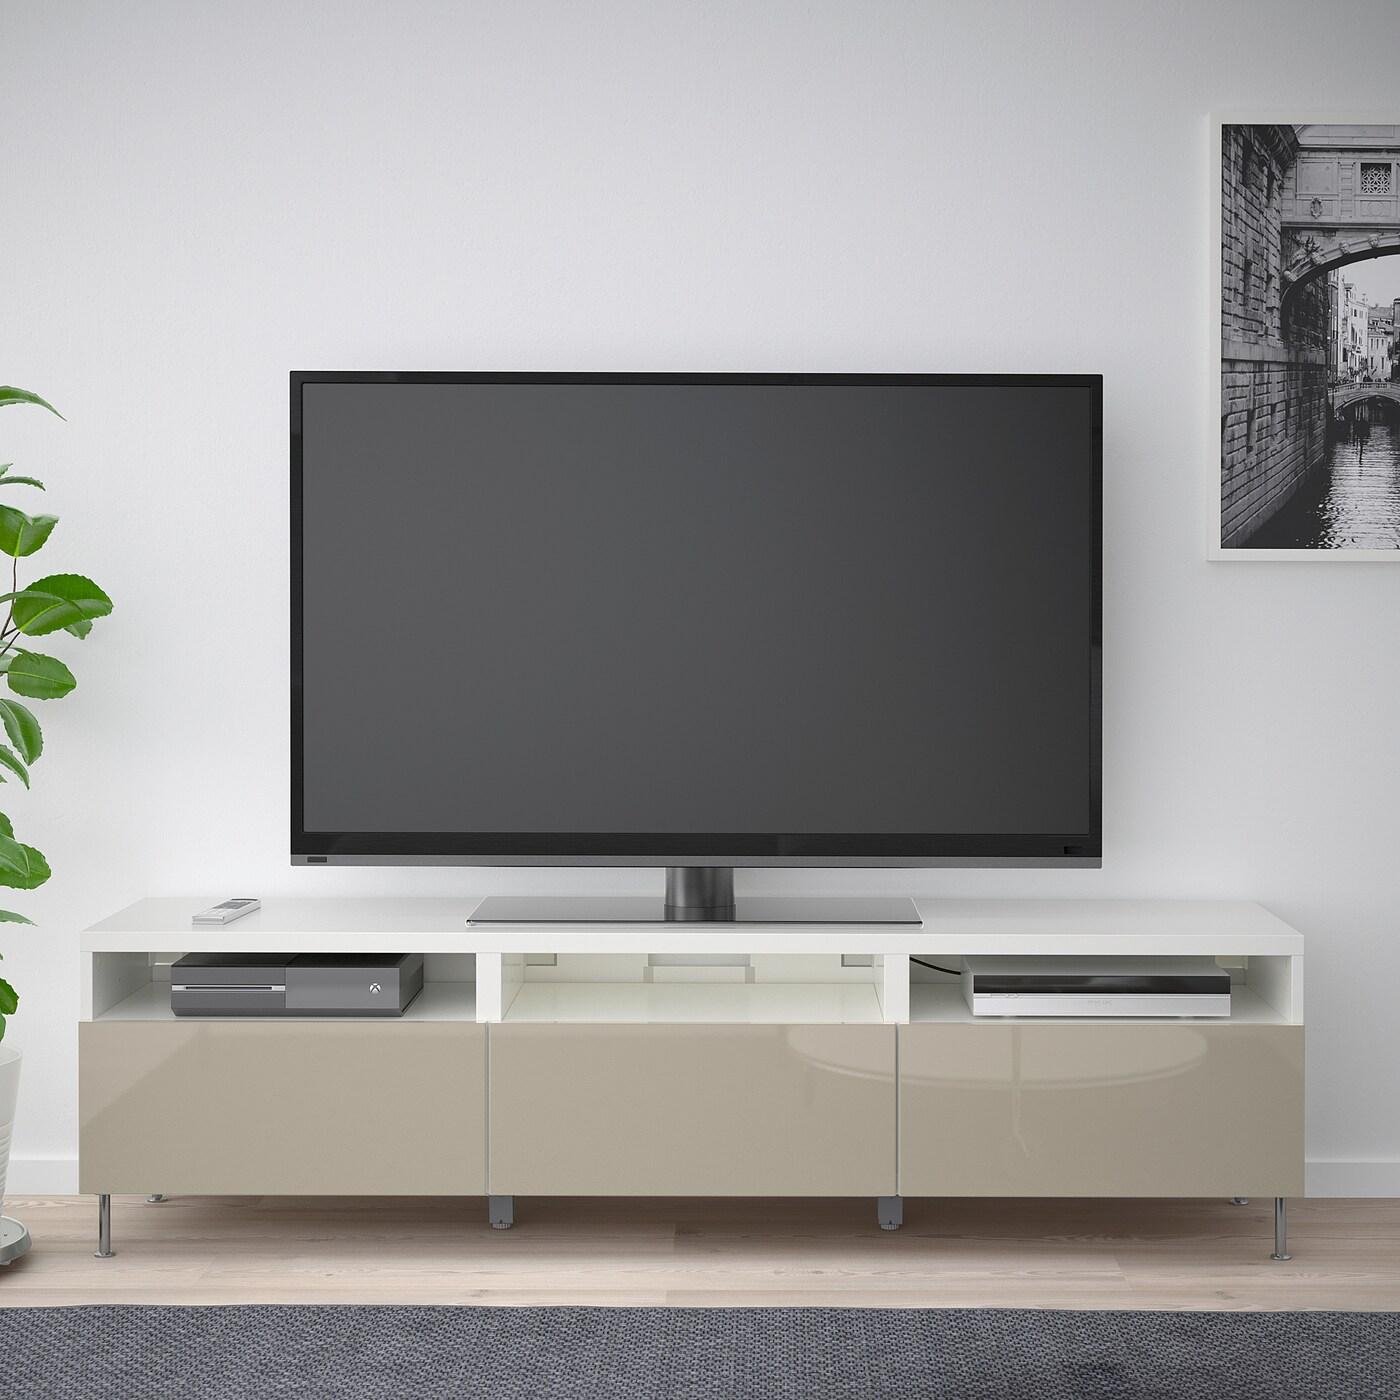 Full Size of Best Tv Bench With Drawers White Kunstleder Sofa Led Beleuchtung Bad Modulküche Ikea Lampen Wohnzimmer Lederpflege Mit Wildleder Panel Küche Chesterfield Wohnzimmer Ikea Led Panel